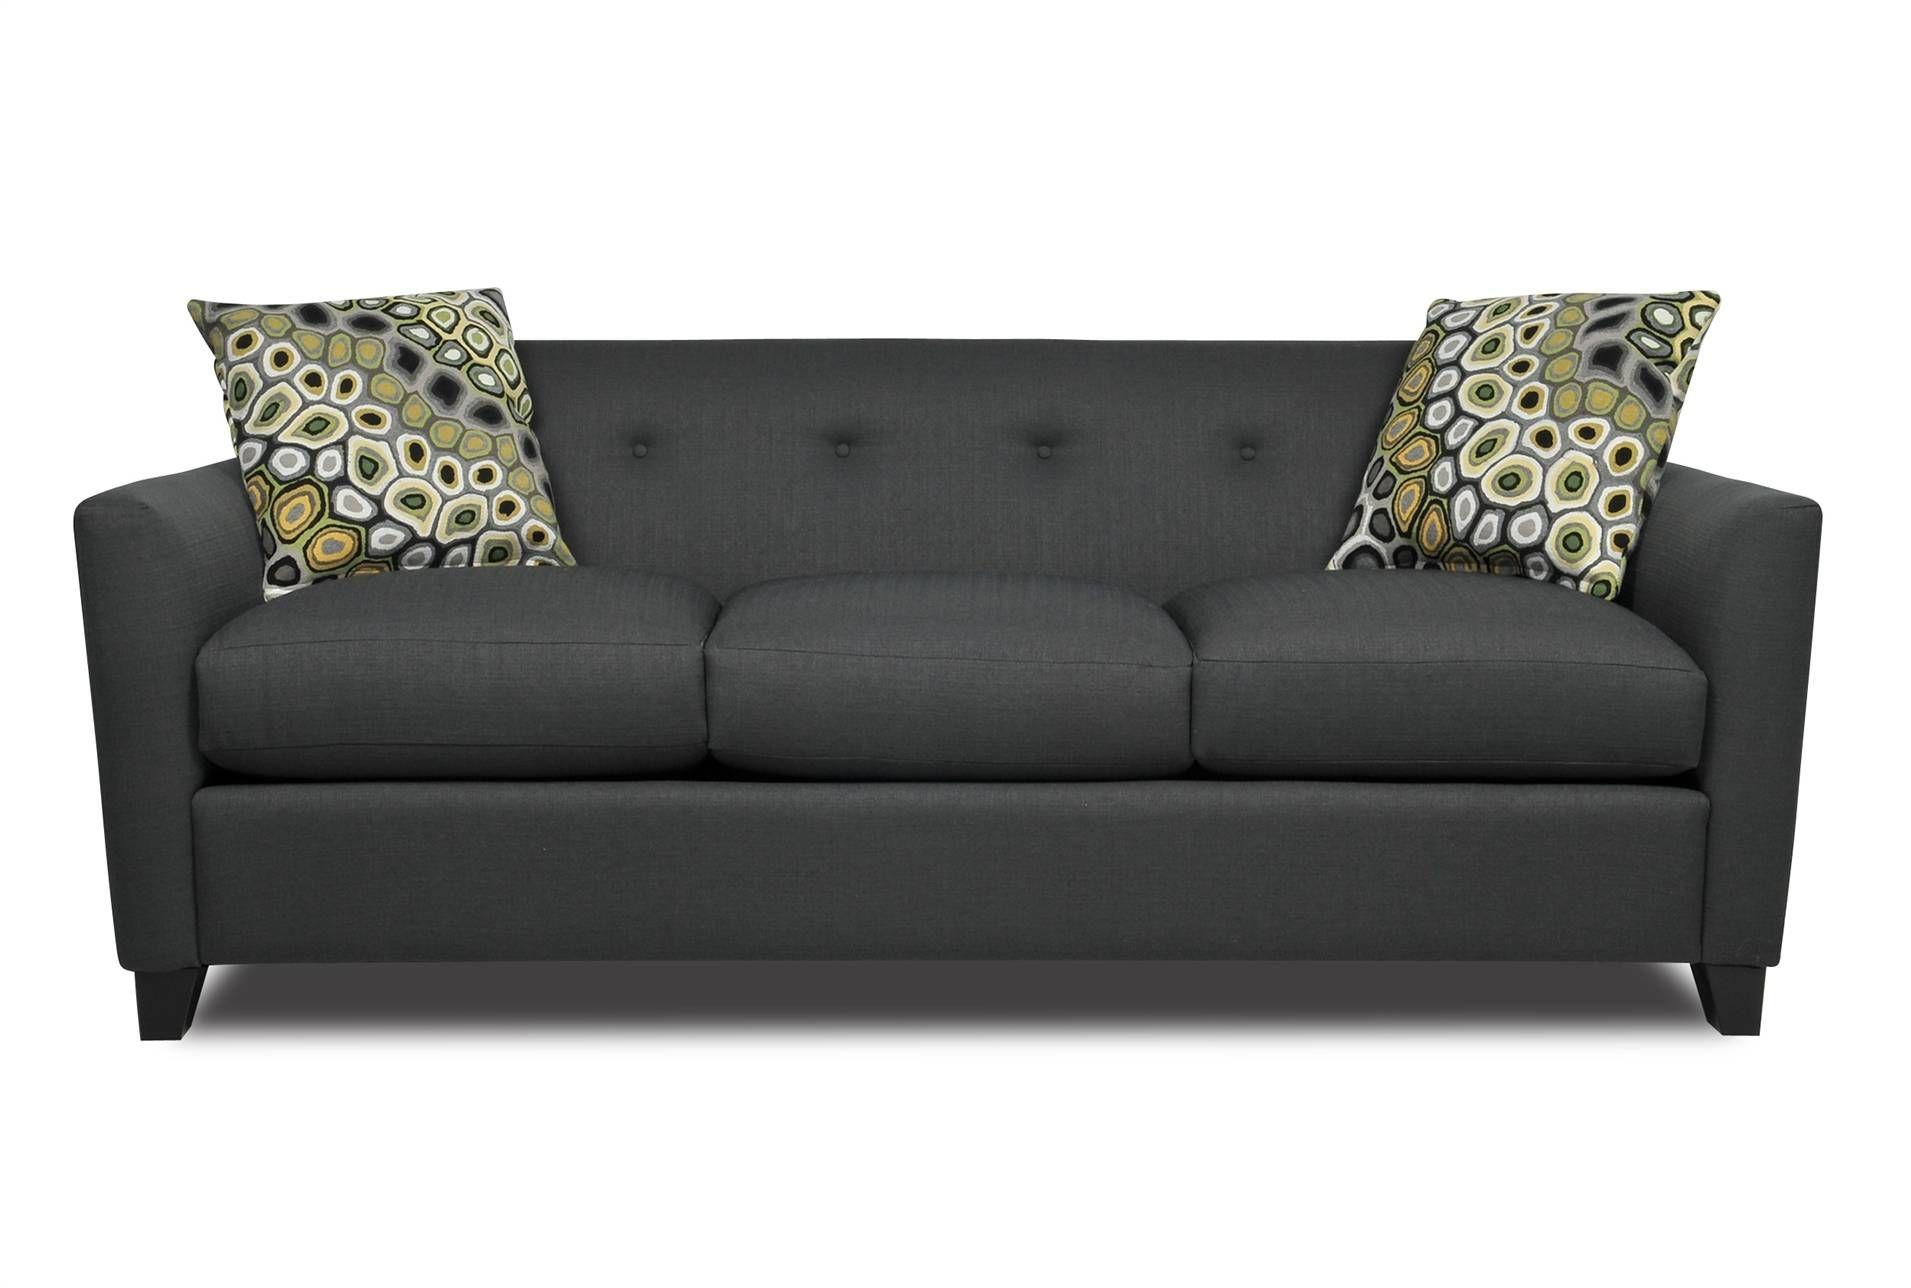 Keegan sofa sofas pinterest living spaces living rooms